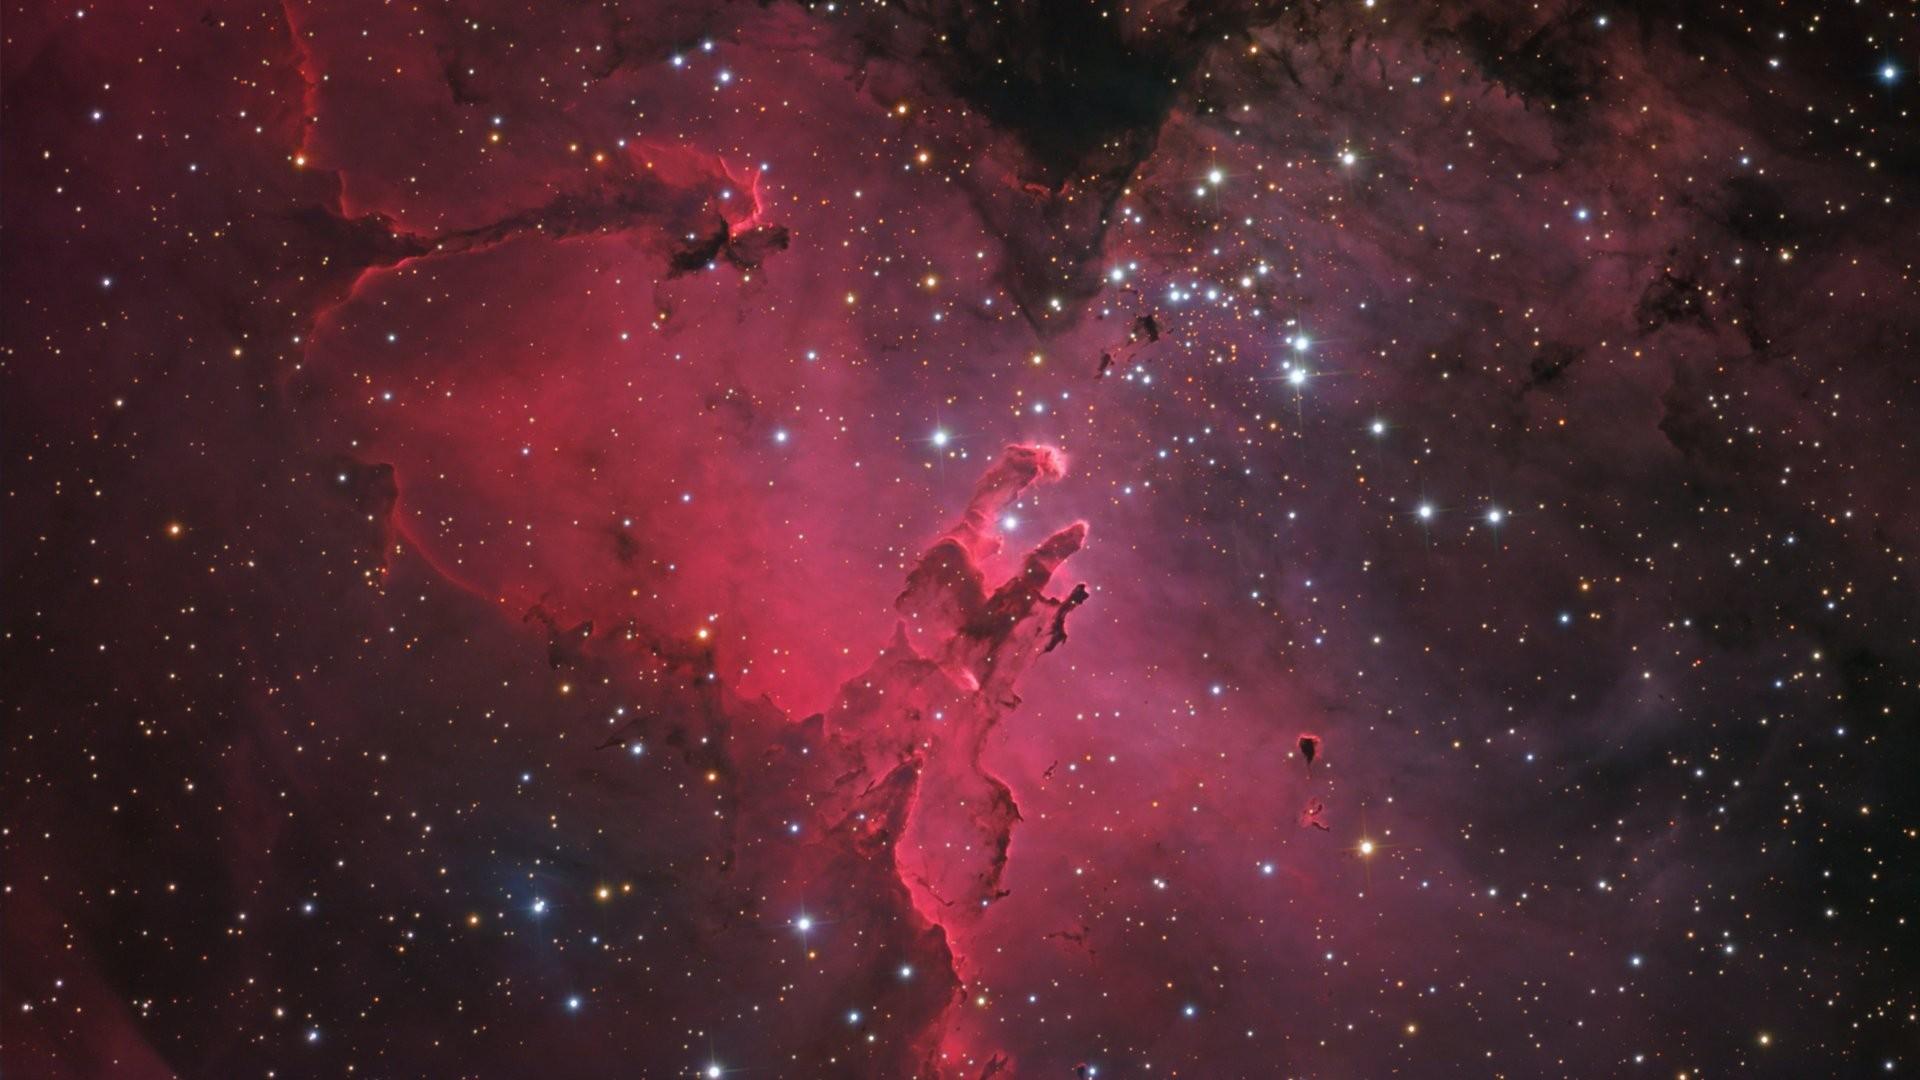 nasa hubble images   High-def Stars Galaxies NASA Hubble Desktop  Background: px